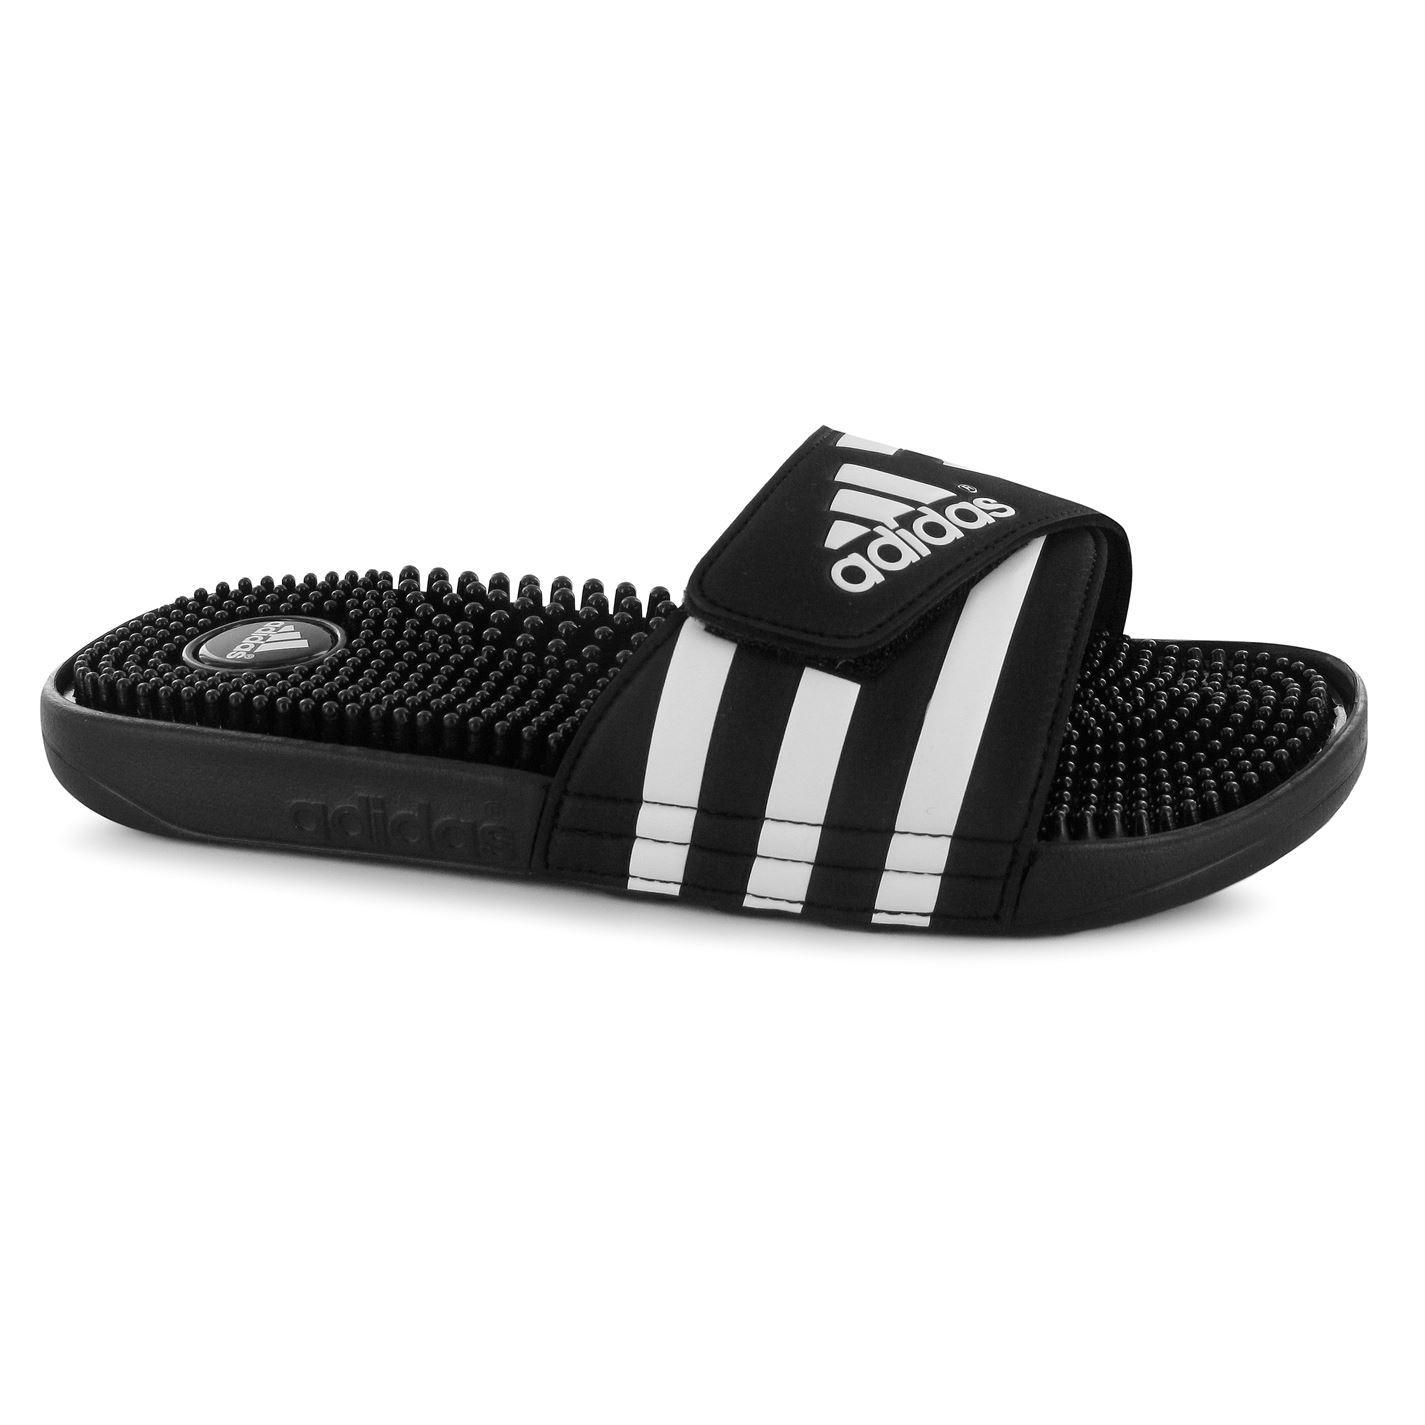 Shoes Sandals Adidas Adissage Summer Massage Mens Slides Footbed BqAqRn07